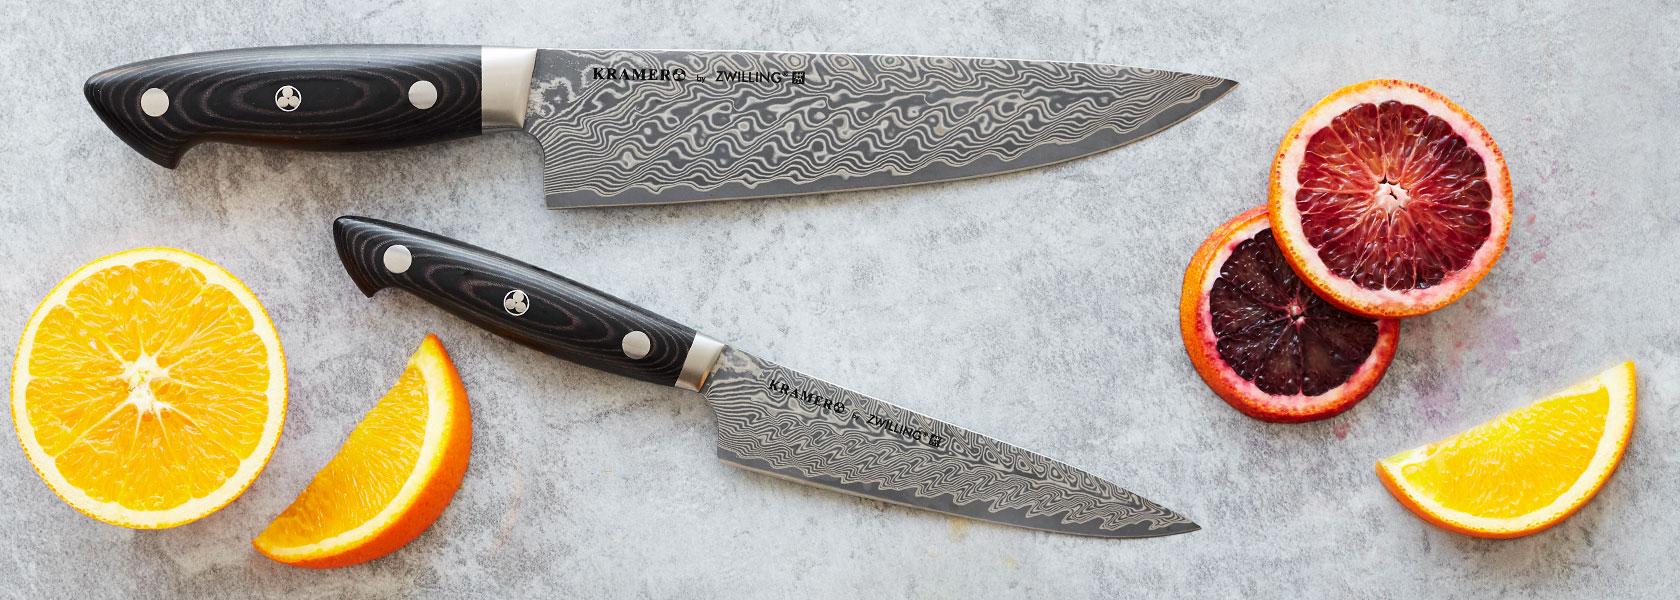 Bob Kramer chef's knives